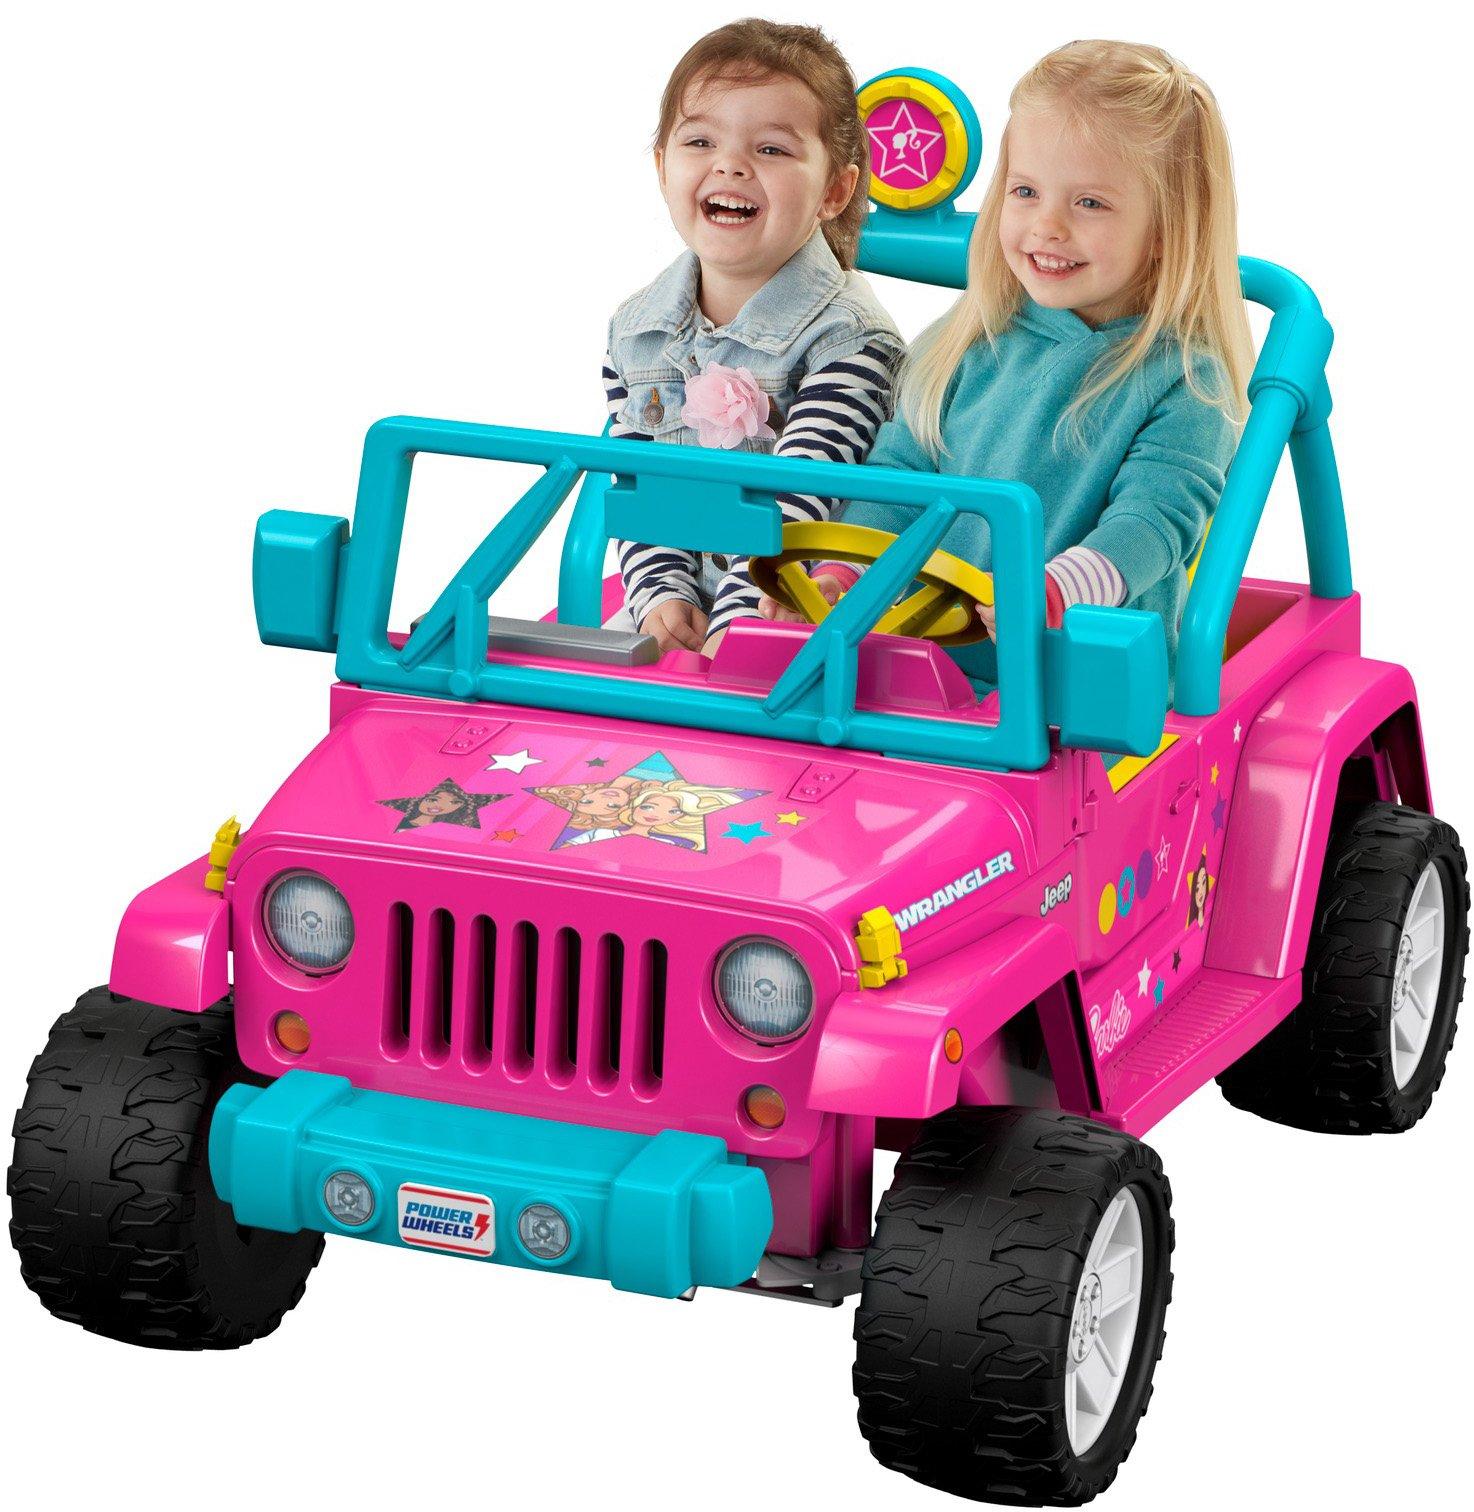 Power Wheels Barbie Jeep Wrangler by Fisher-Price